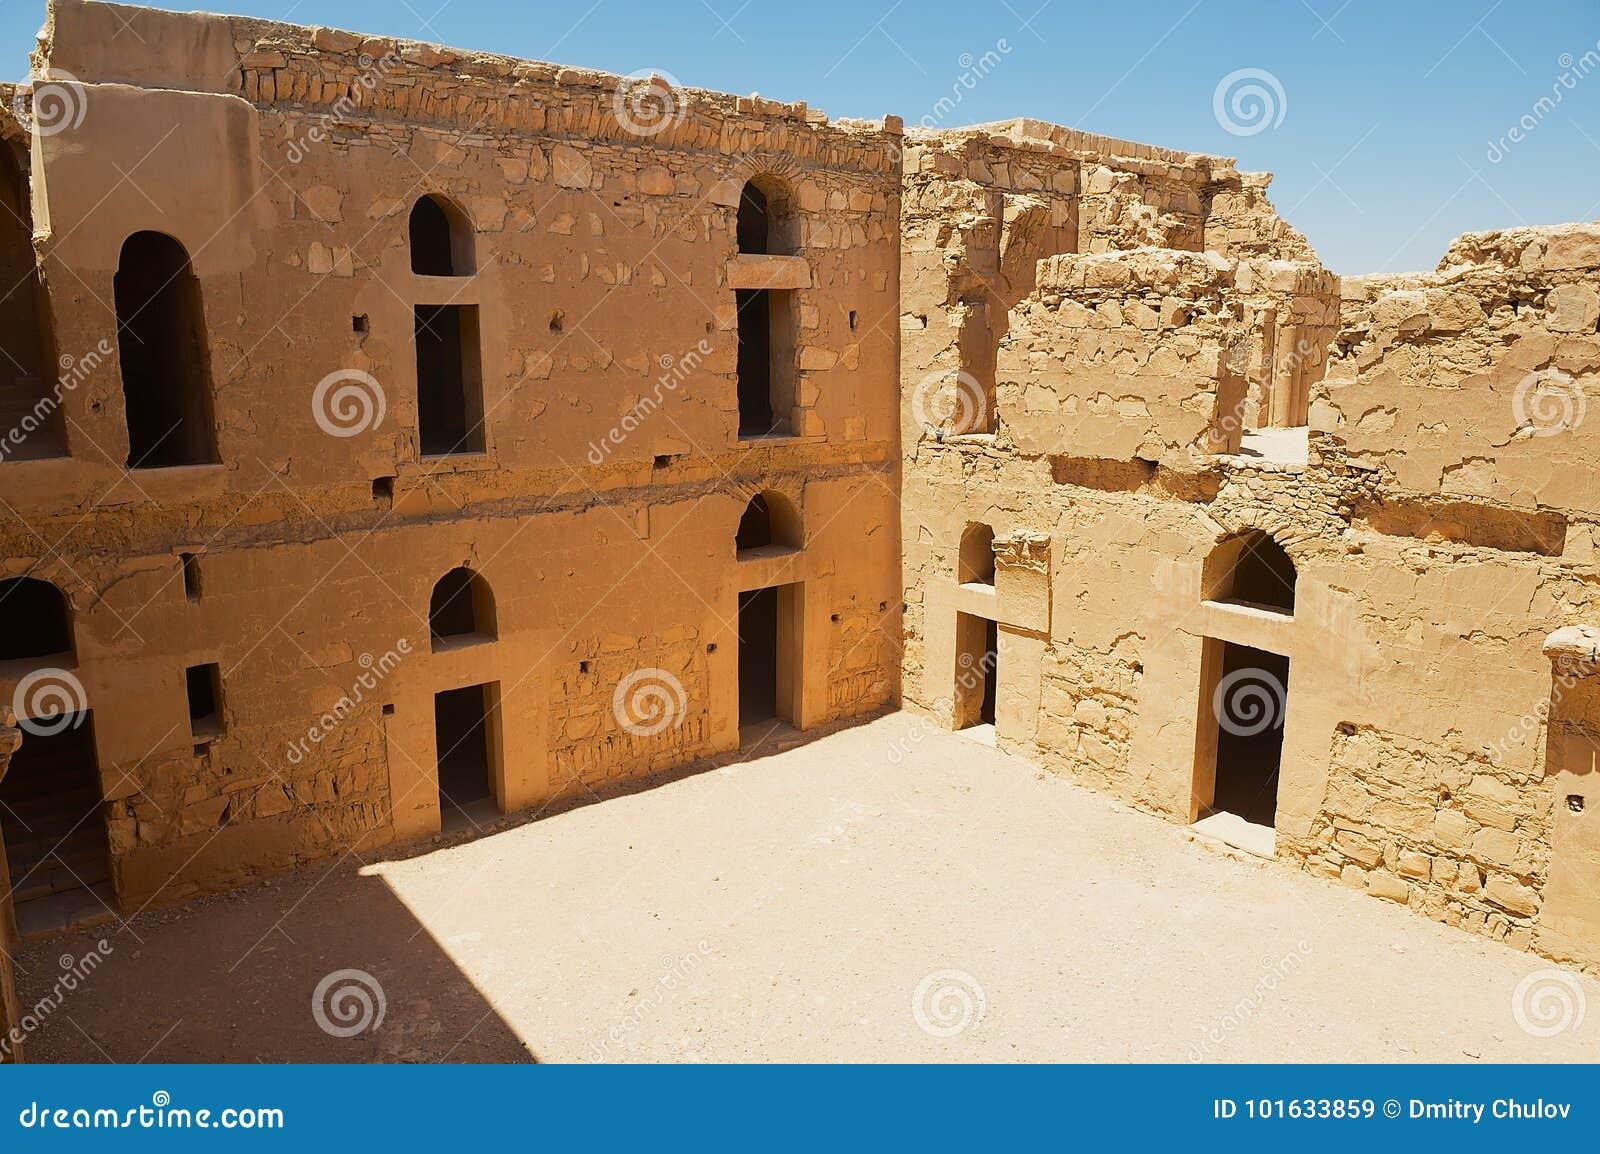 Yarda interior del castillo abandonado Qasr Kharana Kharanah o Harrana del desierto cerca de Amman, Jordania